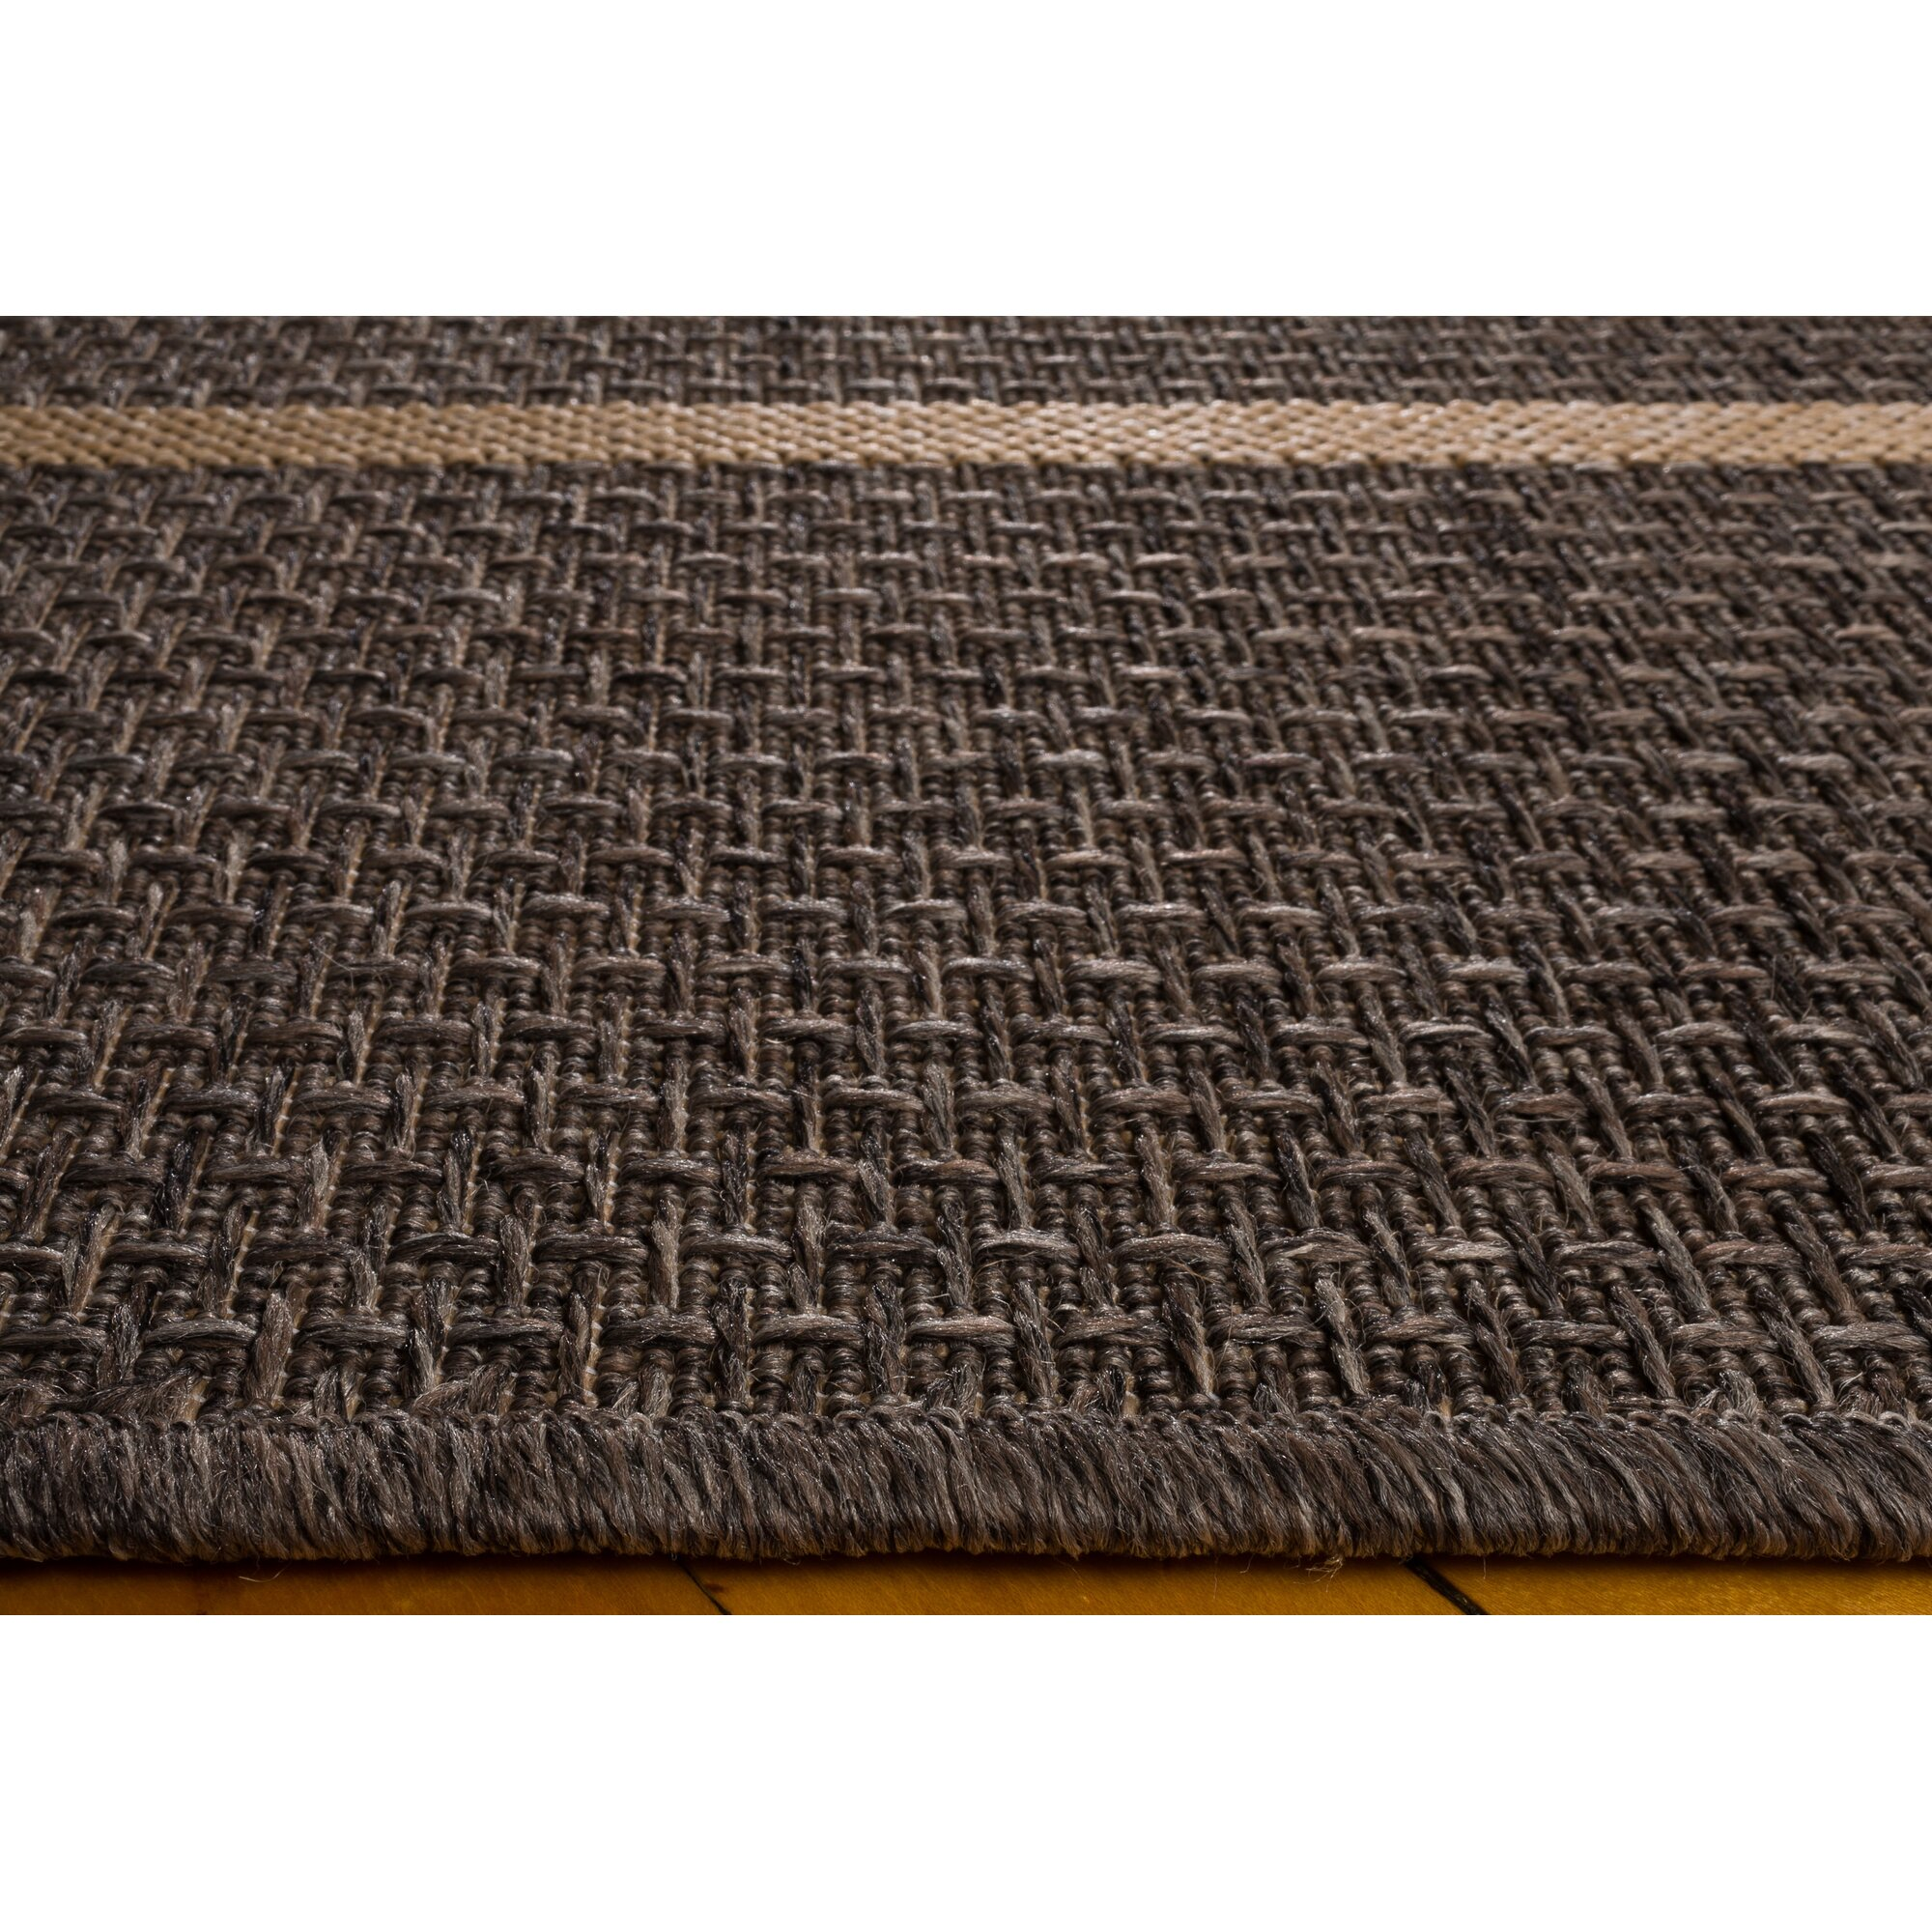 Union rustic annica grey indoor outdoor area rug for Landscape indoor area rug